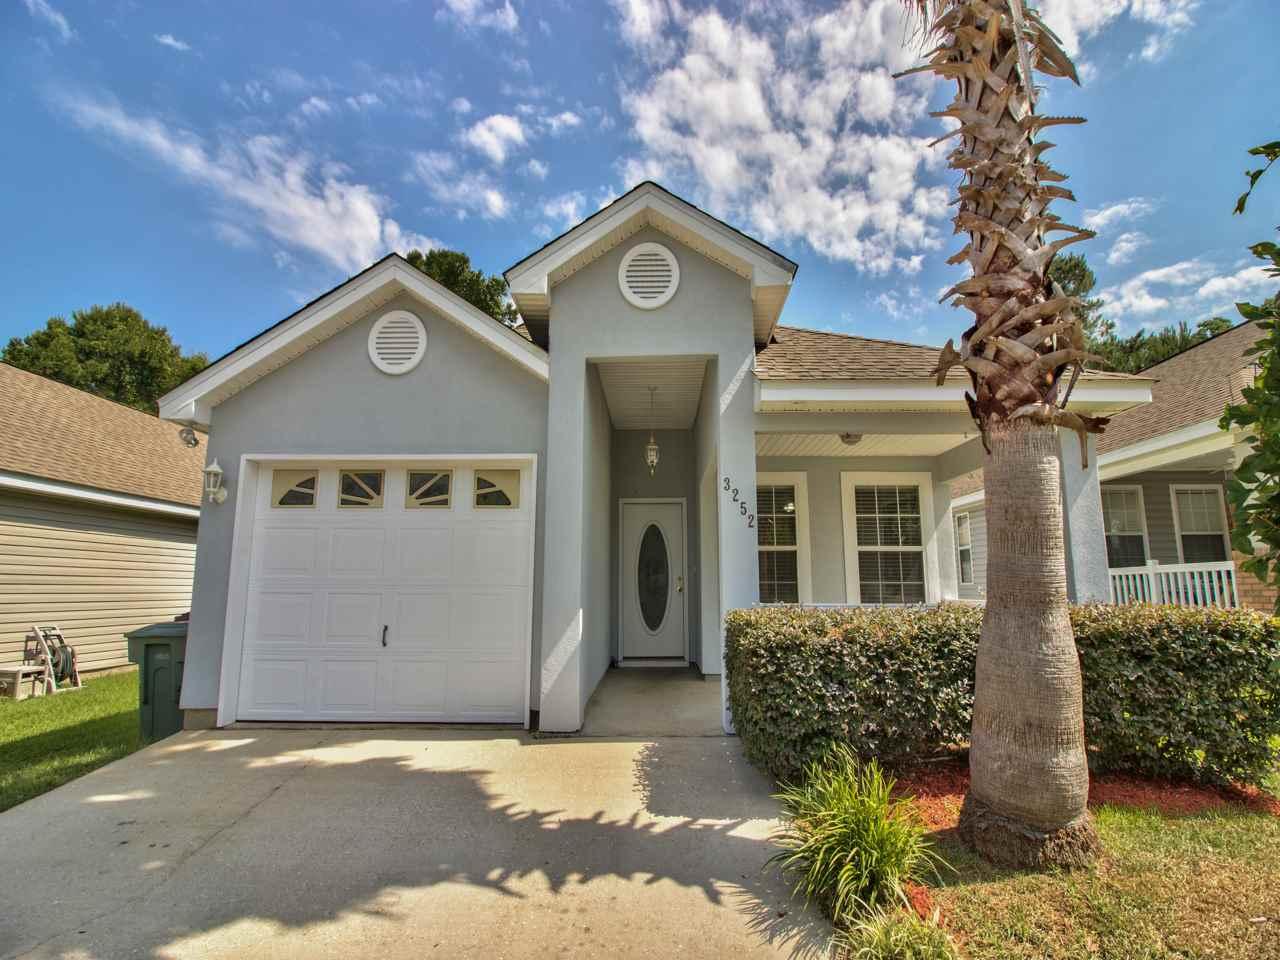 Property ID 309421